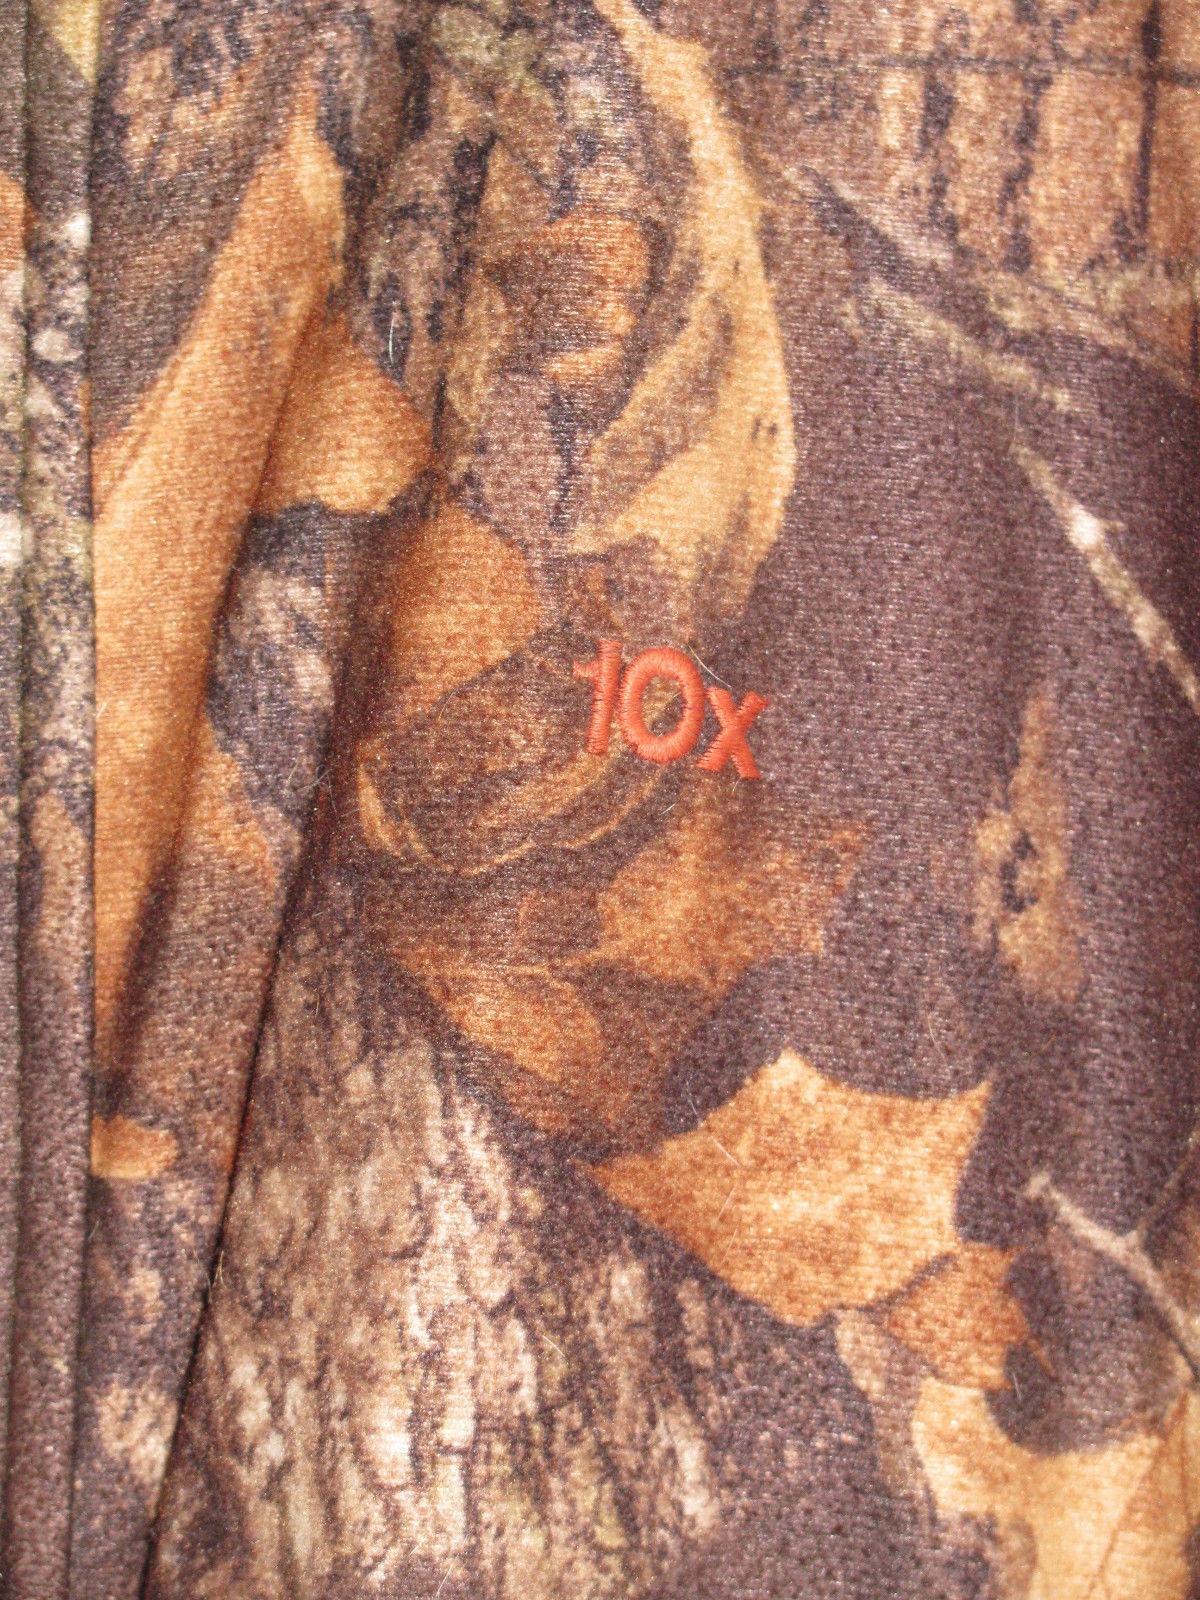 CAMOUFLAGE 10X REVERSIBLE JACKET & VEST-HUNTING-DEER-FISHING-BEAR-WOODS-SPORTS